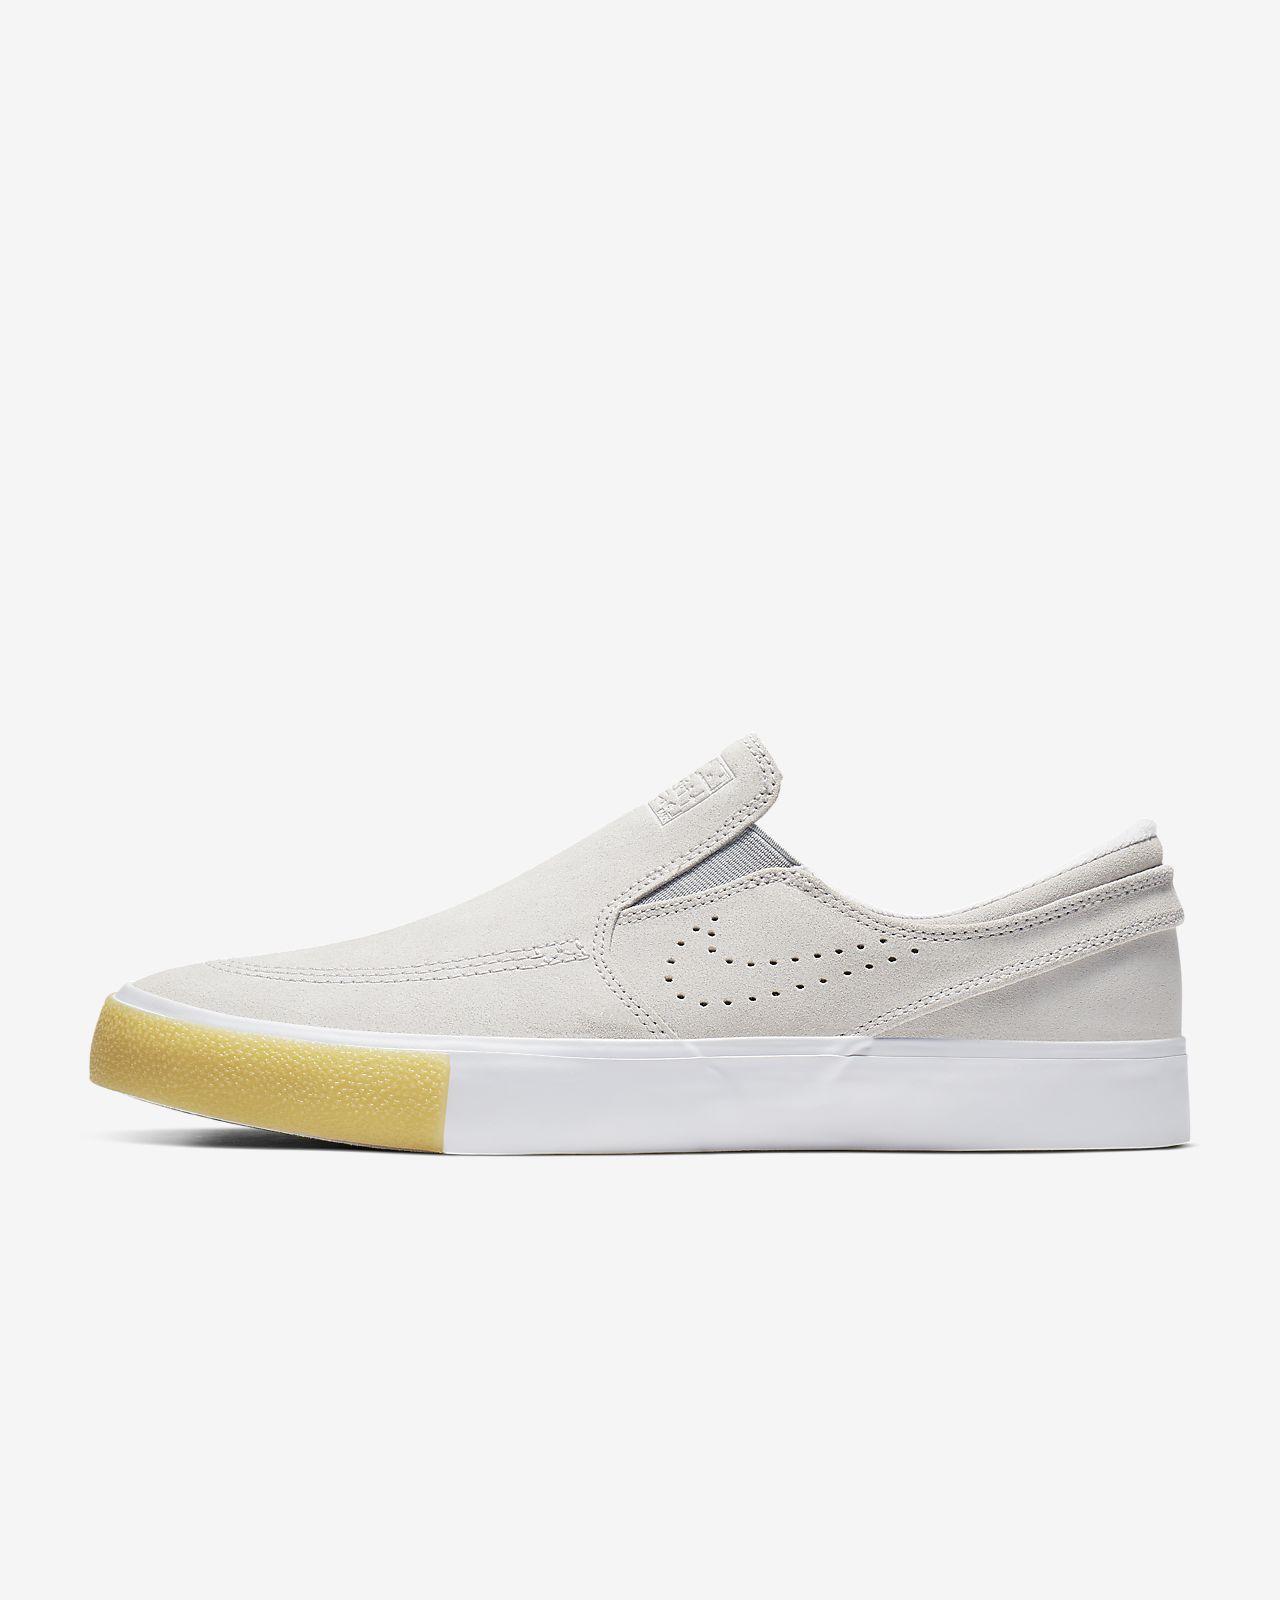 Nike SB Zoom Stefan Janoski Slip RM SE Sabatilles de skateboard